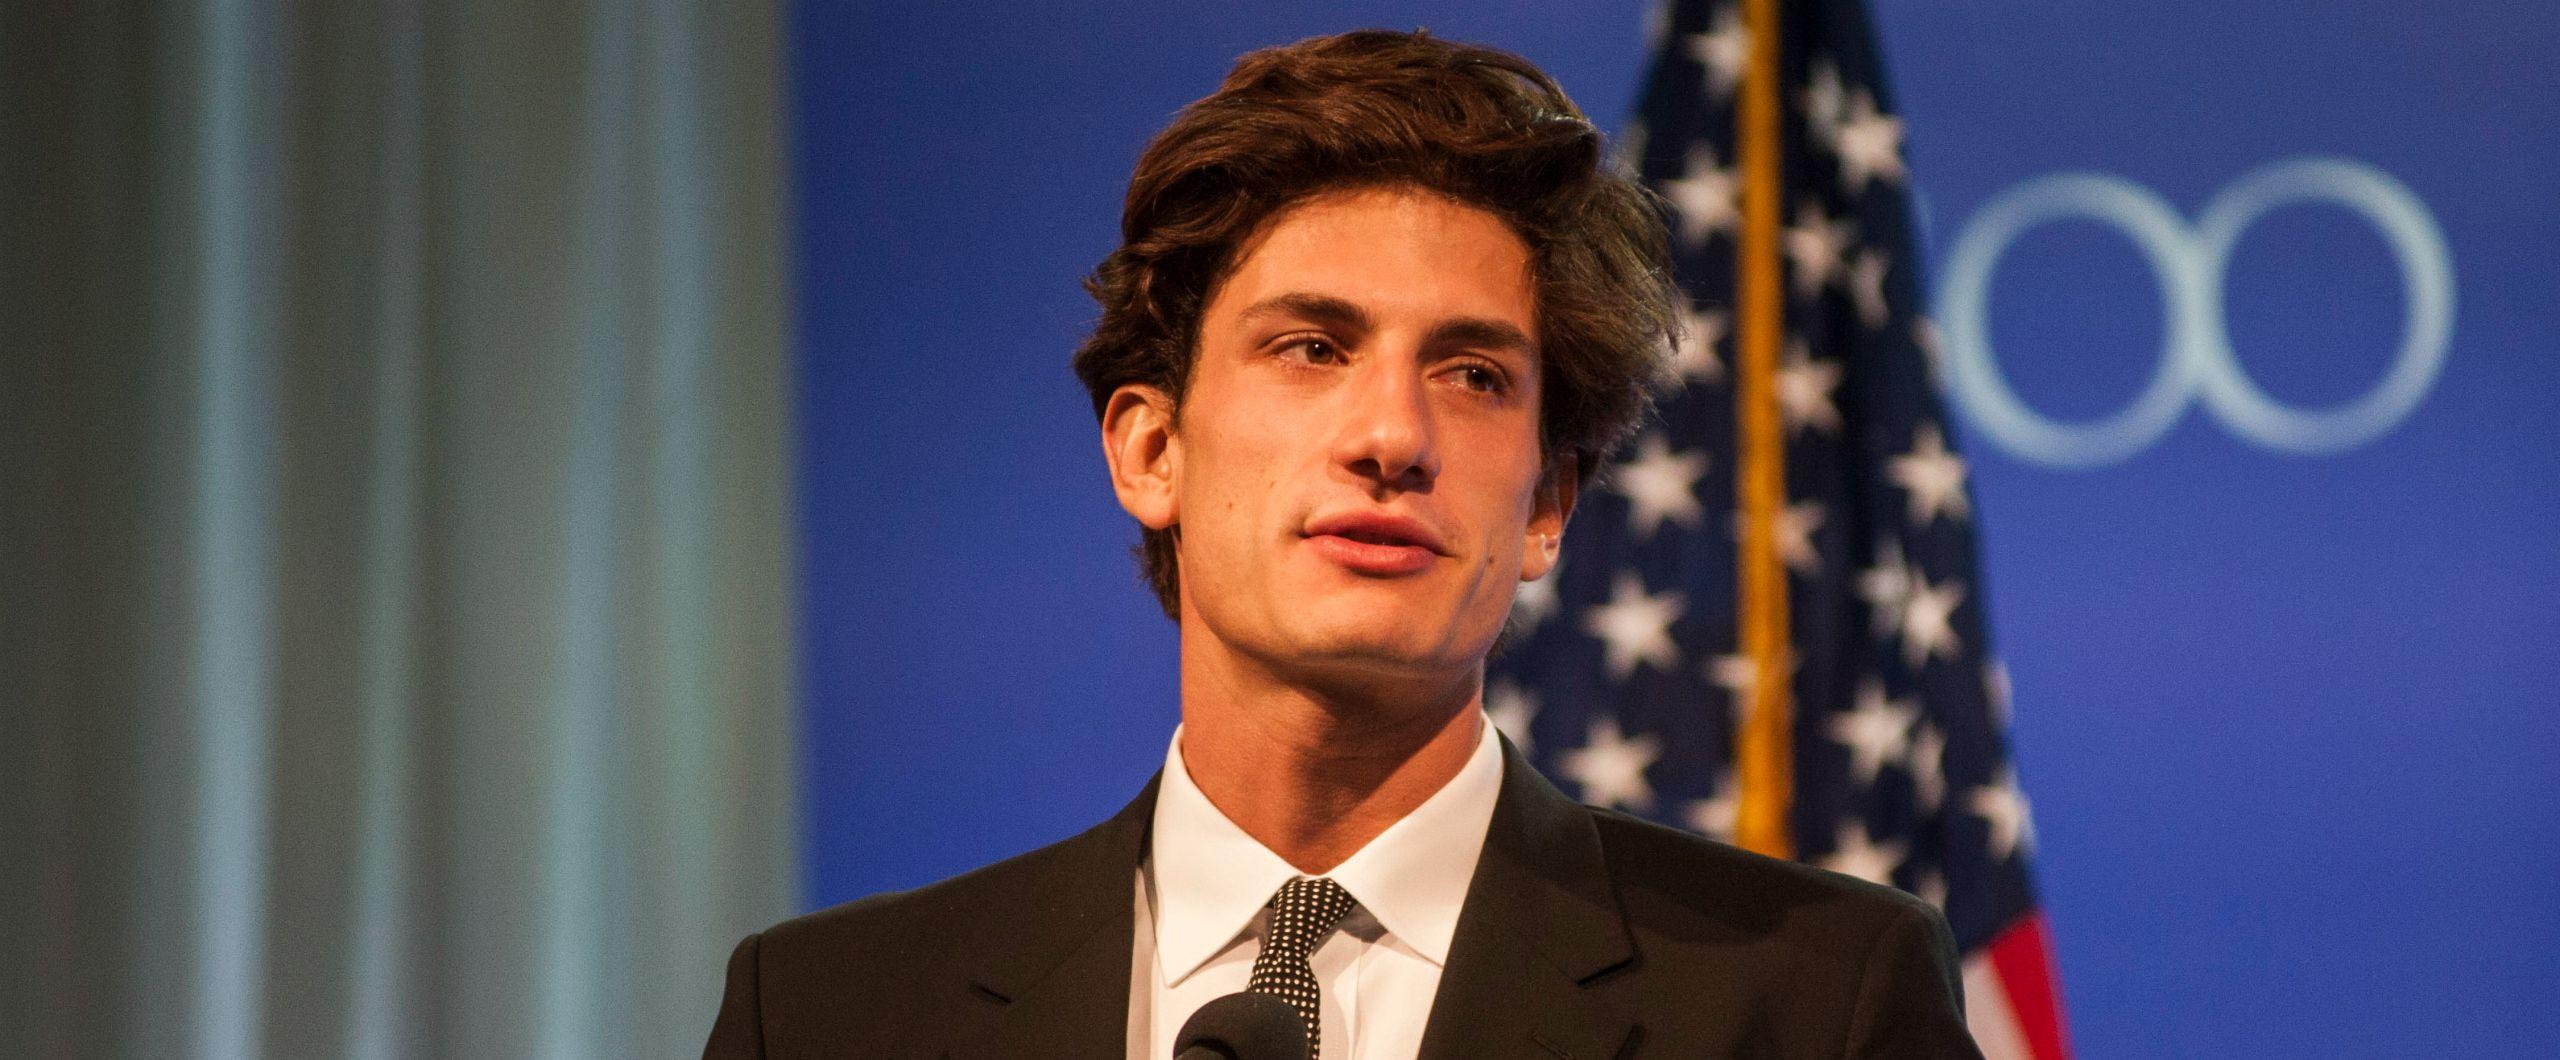 Jack Schlossberg The Grandson Of John F Kennedy Is Ready For